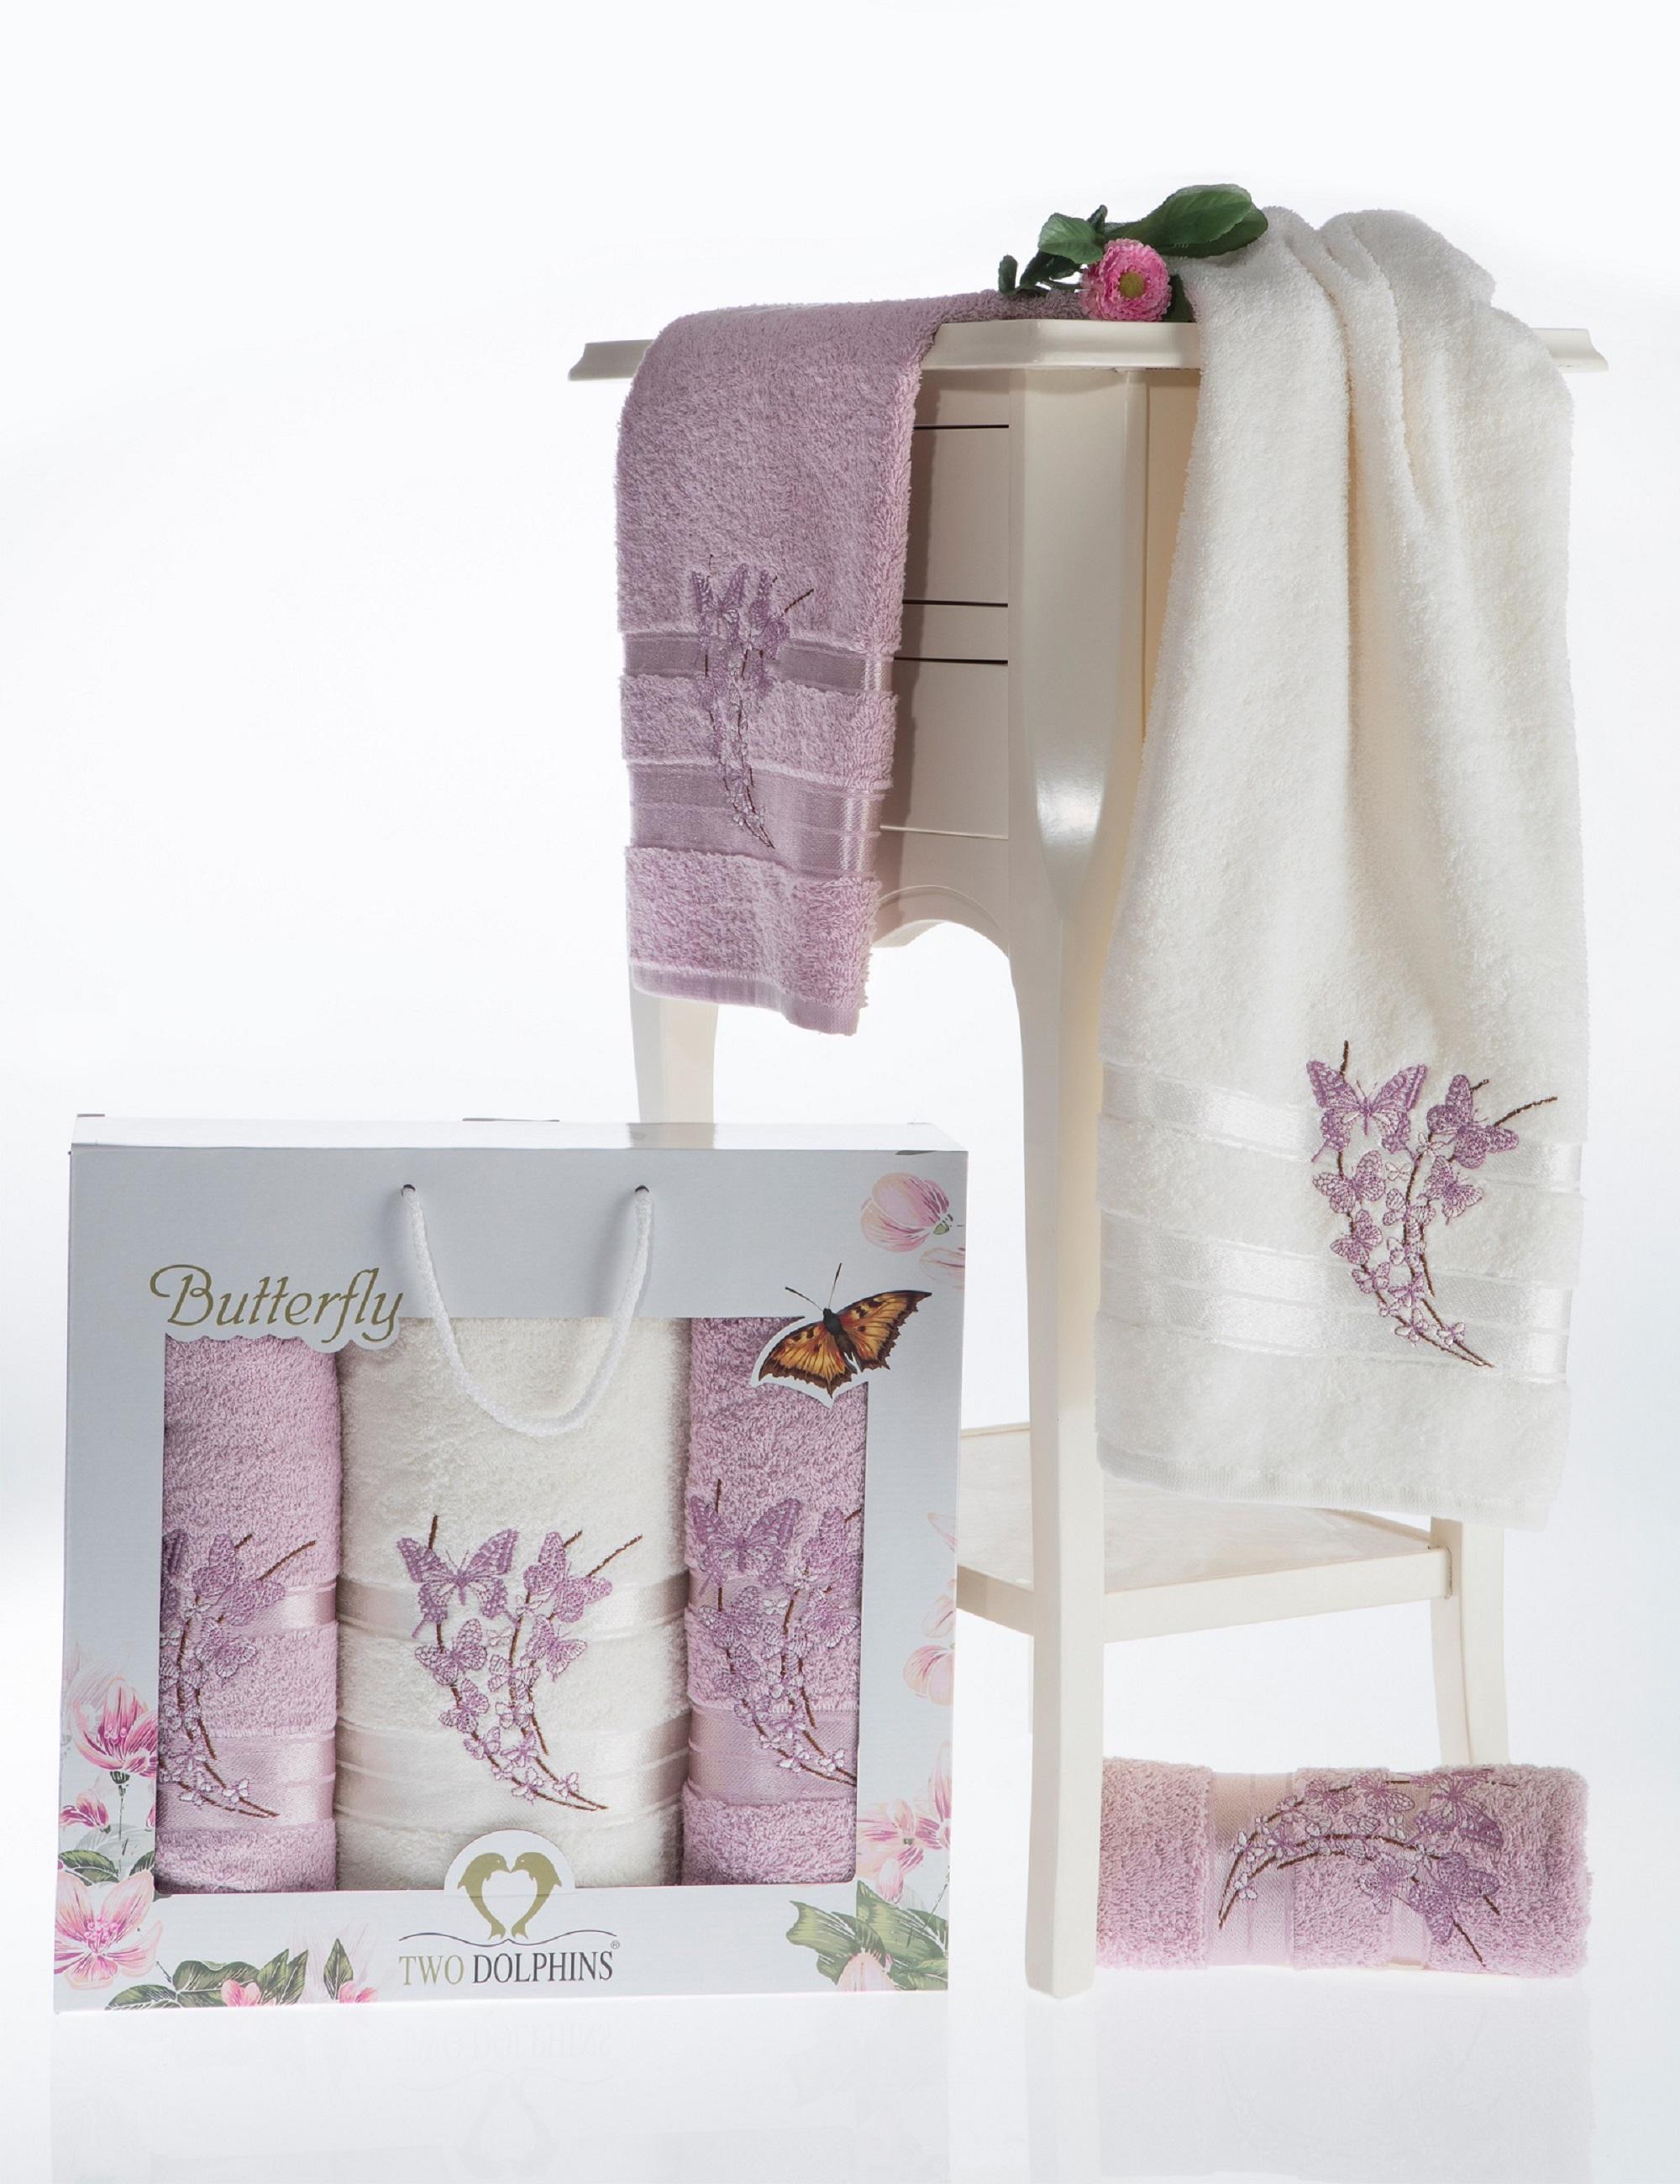 где купить Полотенца Two Dolphins Полотенце Butterfly Цвет: Светло-Розовый (50х90 см - 2 шт,70х140 см) по лучшей цене